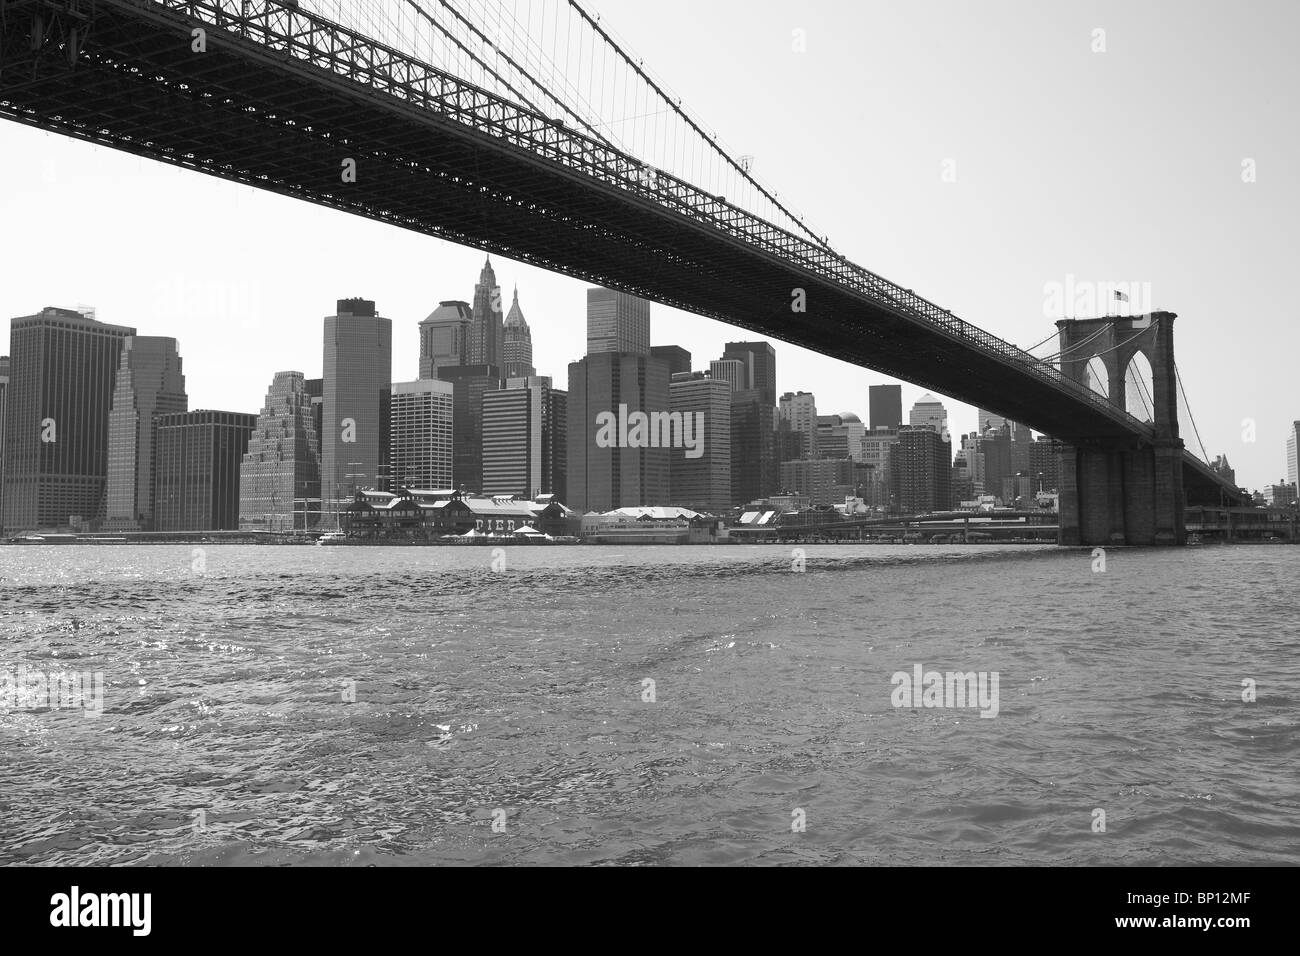 New York City Bridge with view to Manhattan bw - Stock Image